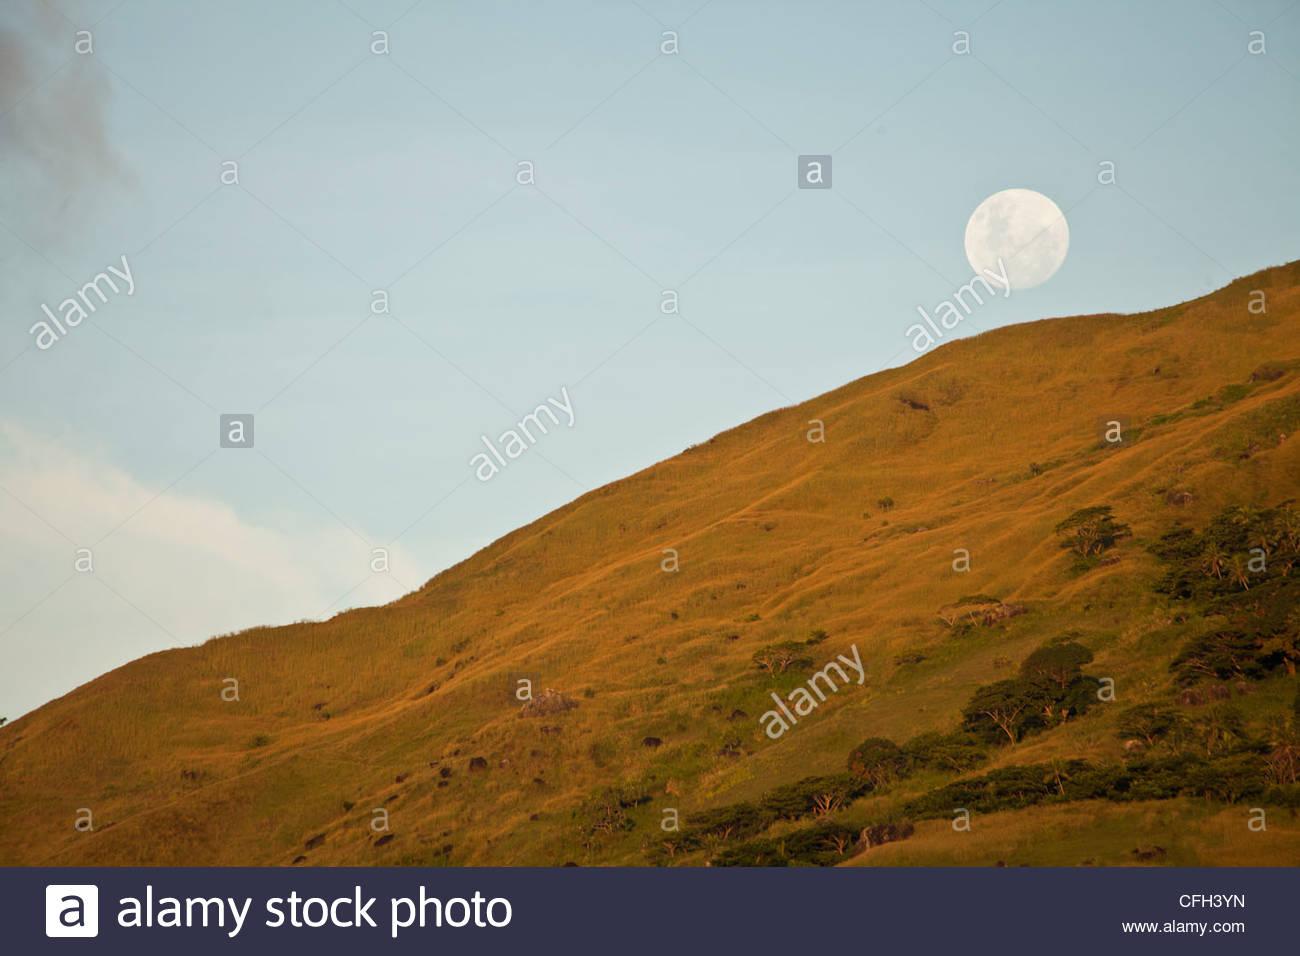 Moonrise seen looking at Southern Yasawa Island of Vanu Levu. - Stock Image